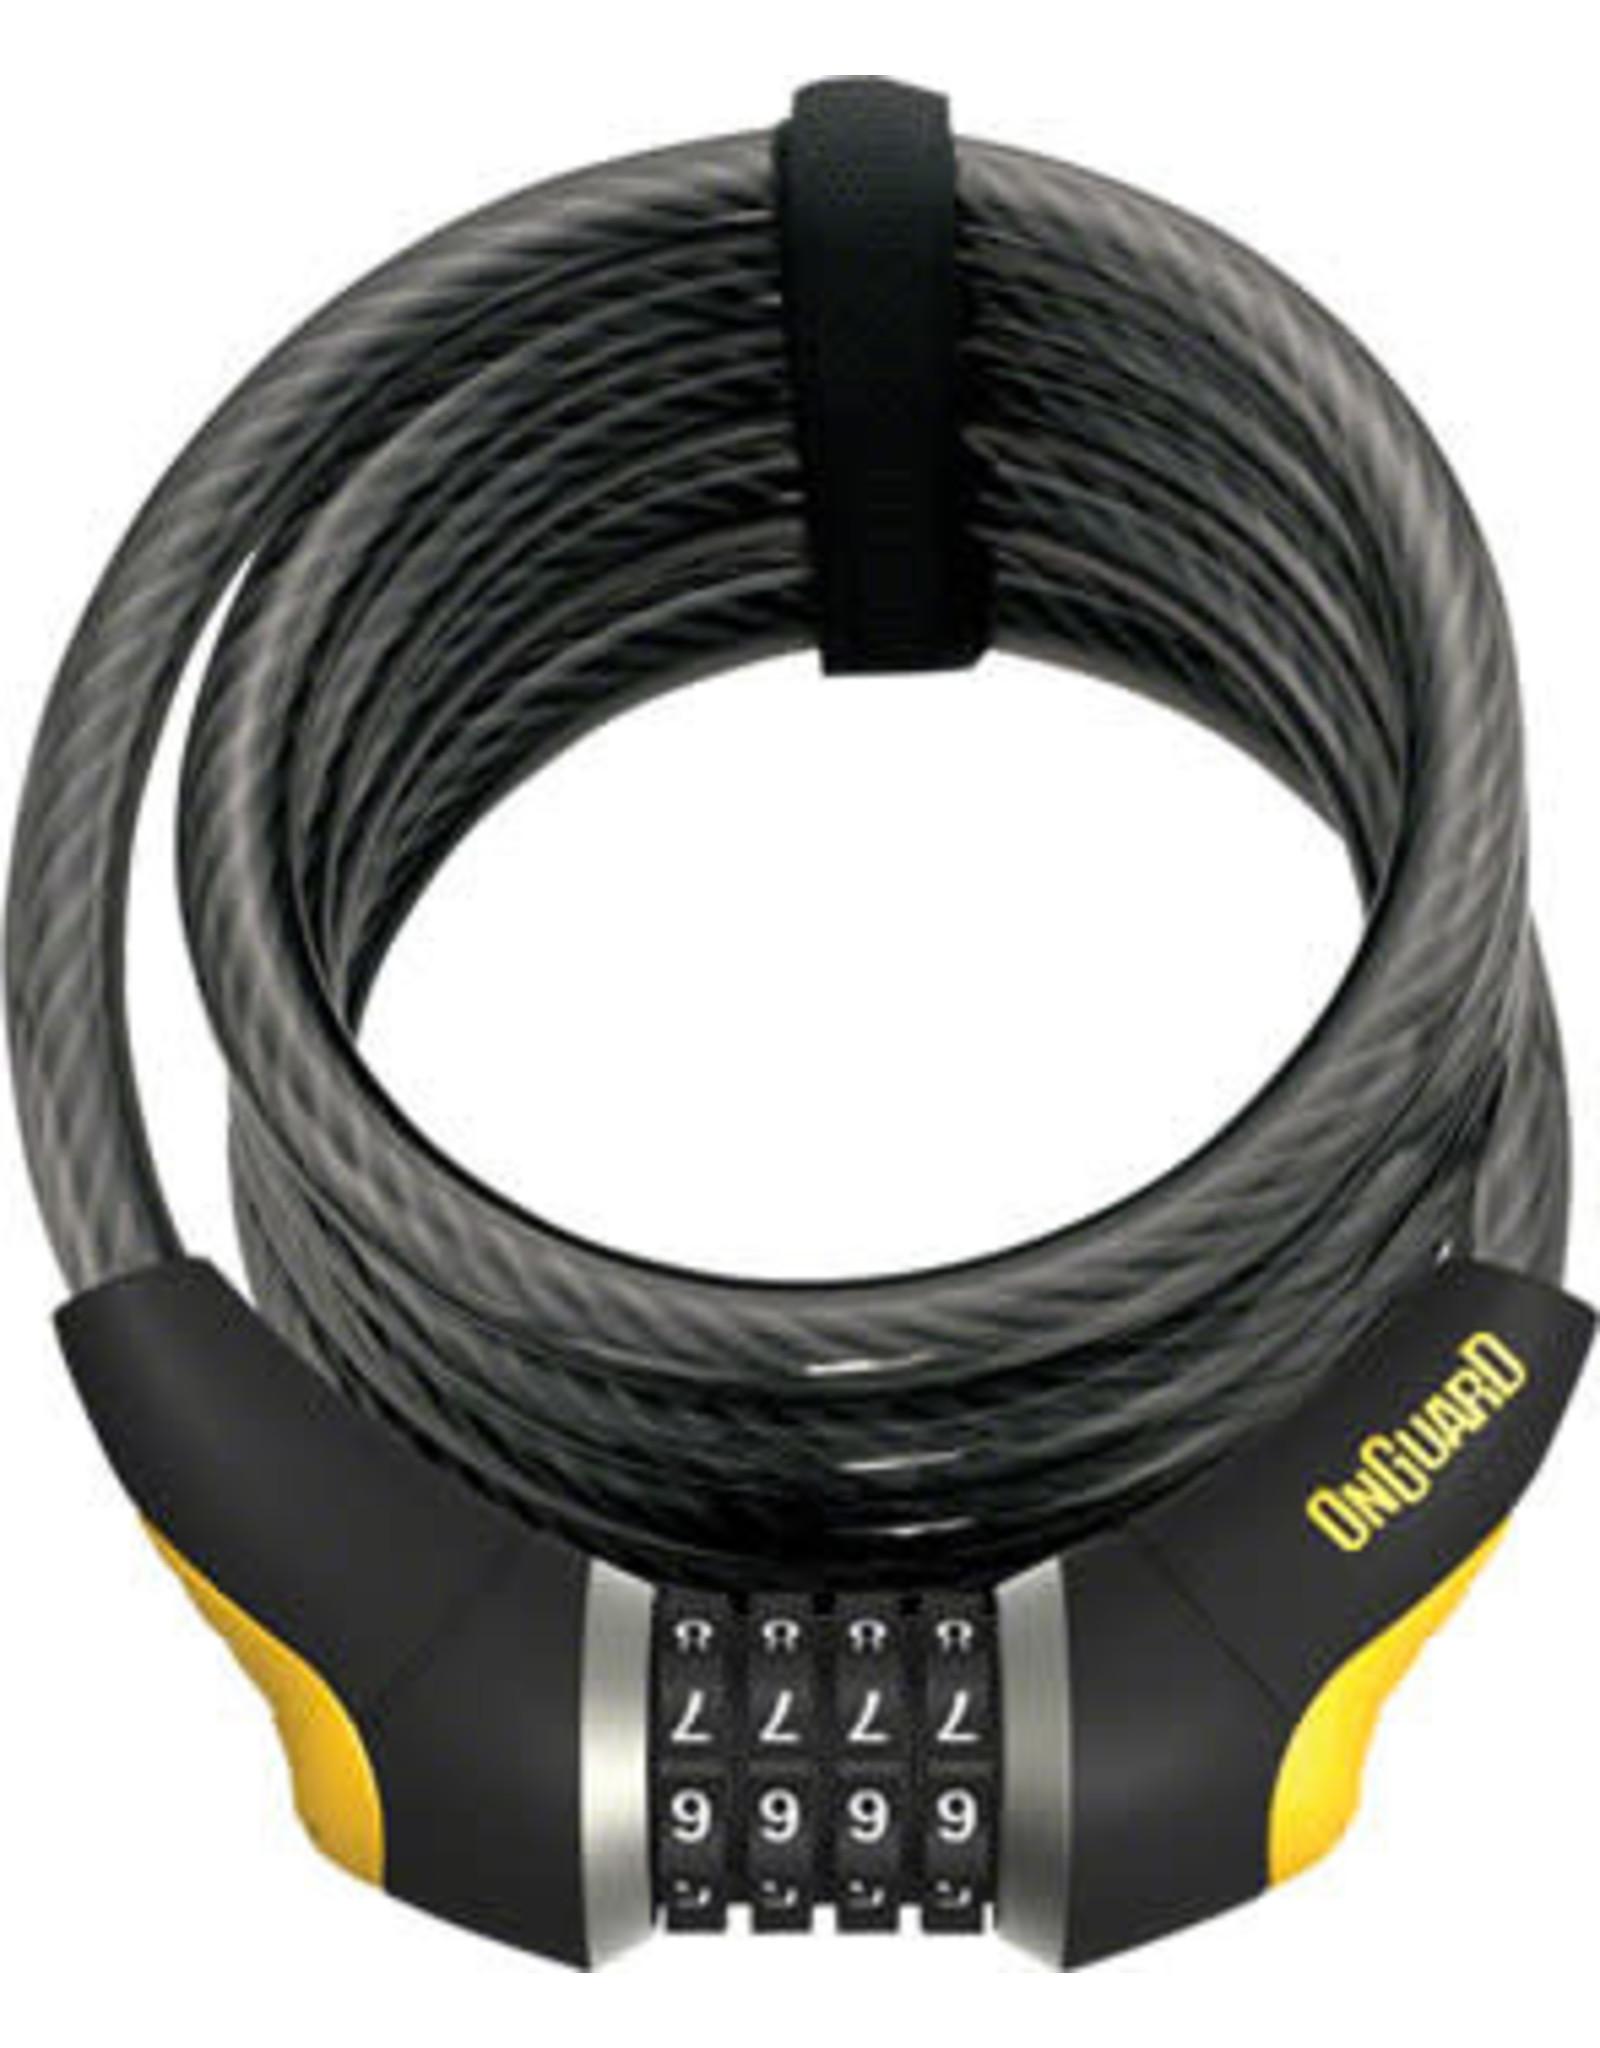 on guard OnGuard Doberman 8031 Combo Cable Lock: 6' x 12mm - Gray/Black/Yellow